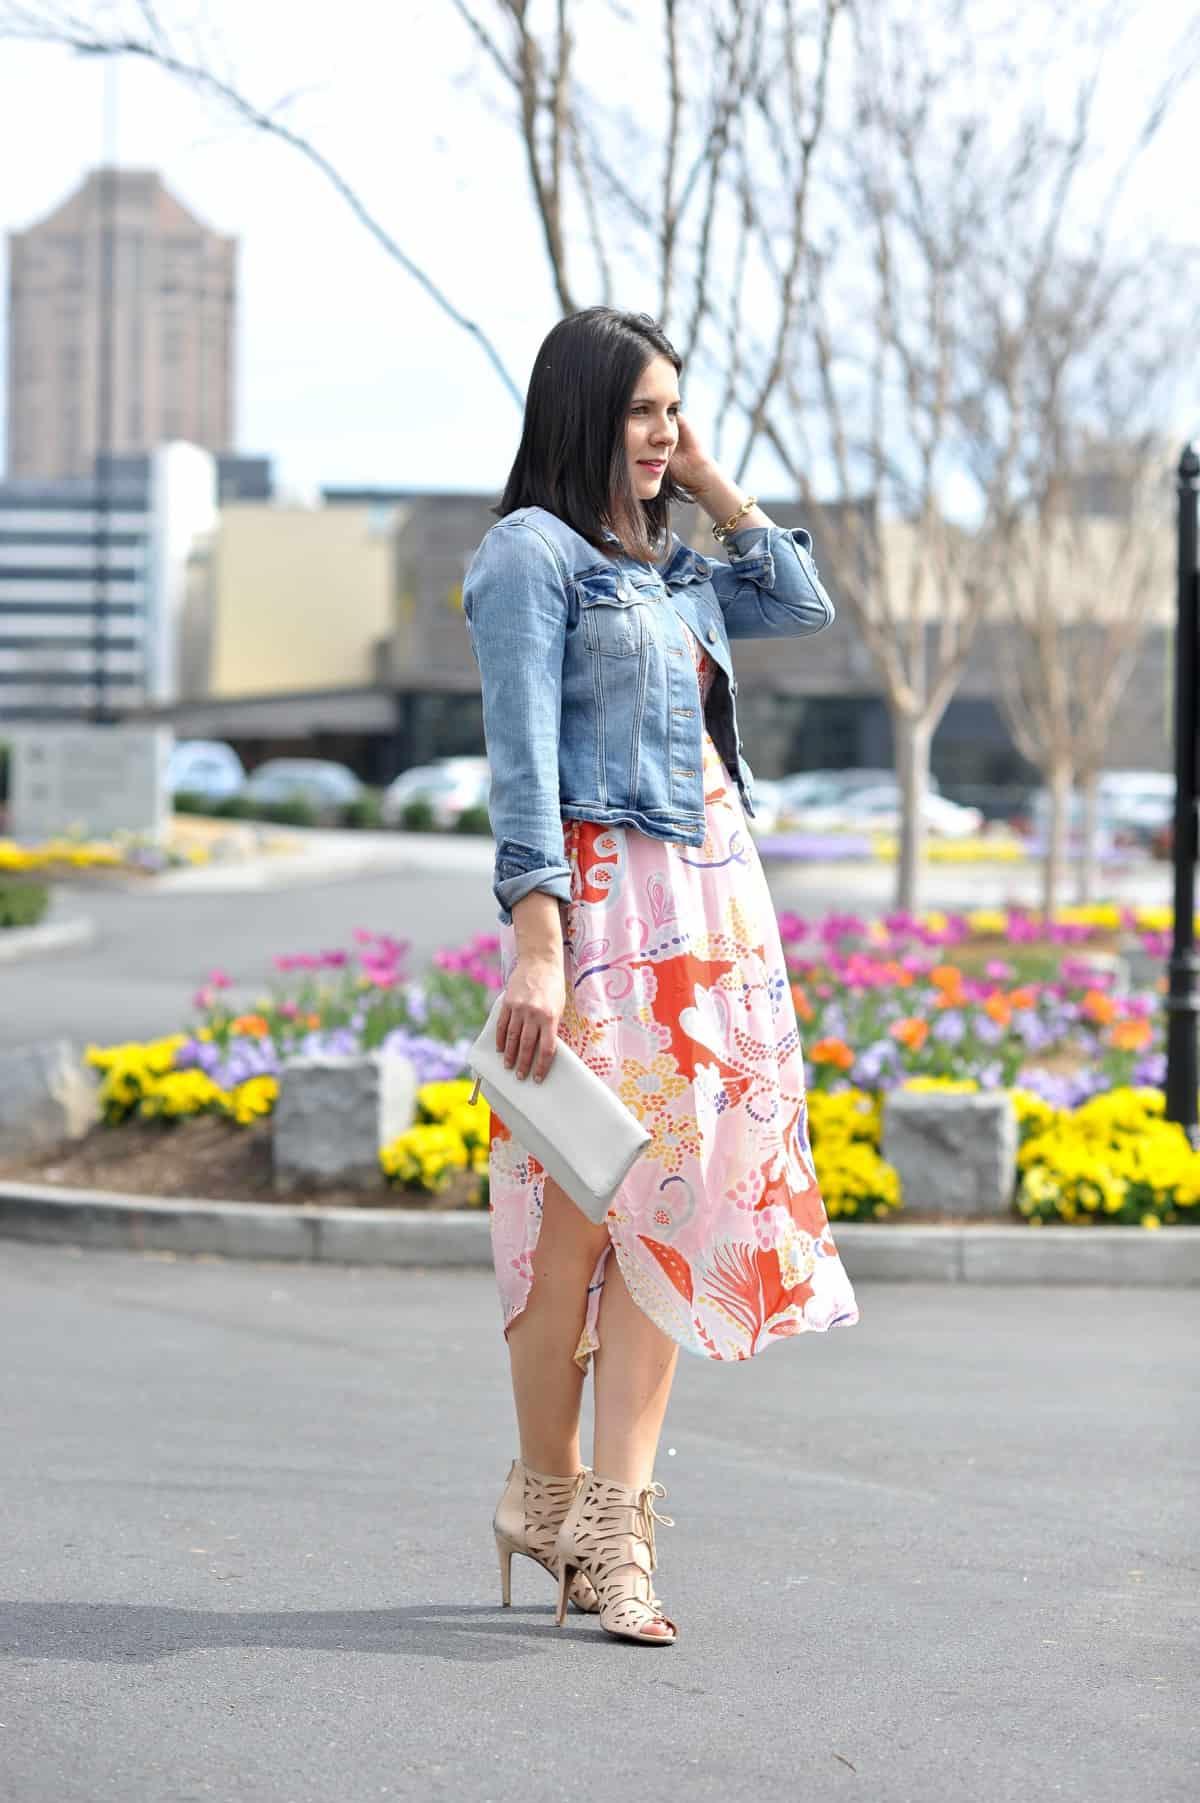 Banjanan Cochella Dress - printed floral dress for summer - My Style Vita - @mystylevita - 4